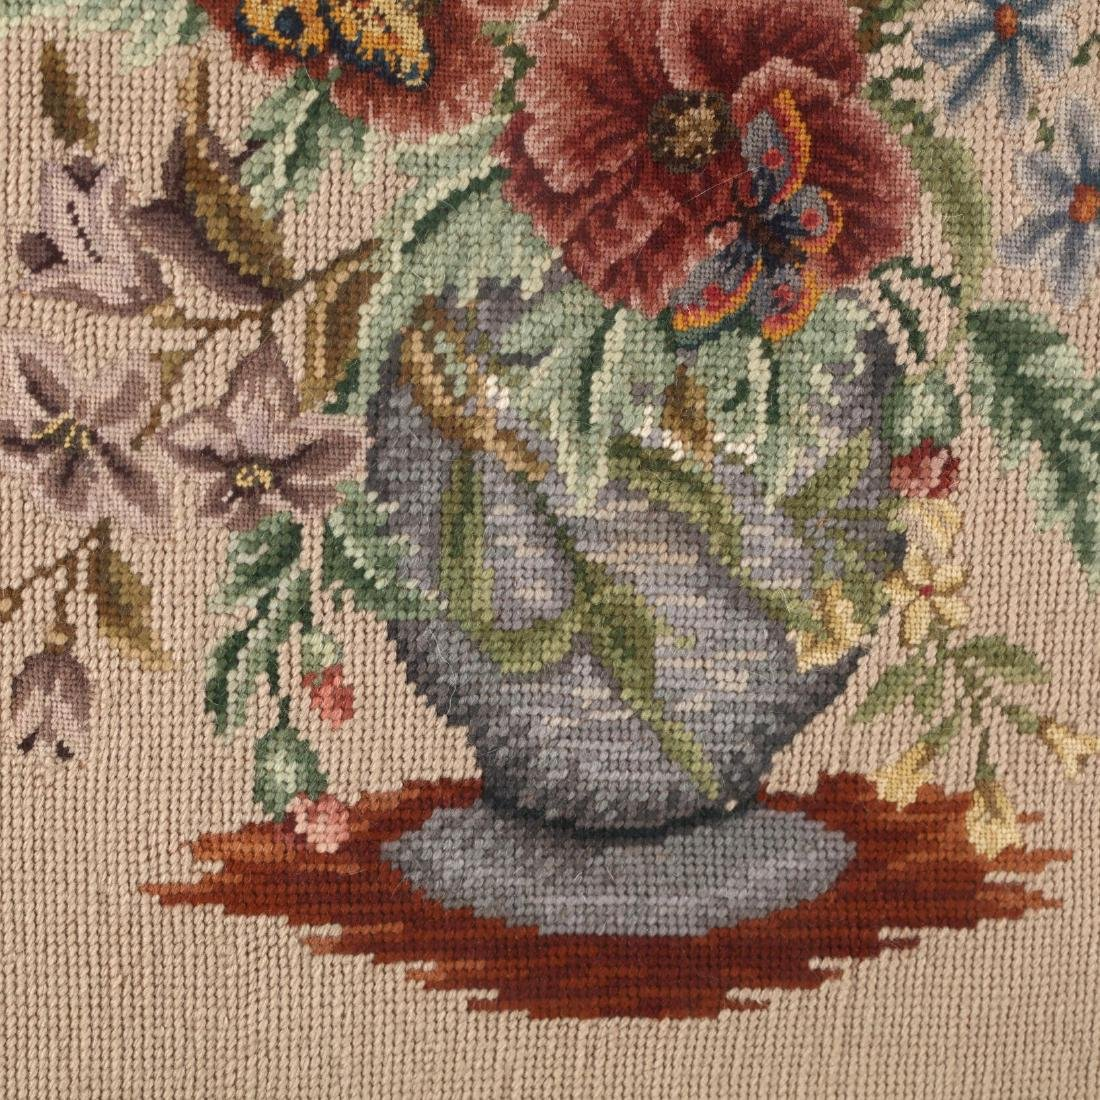 A Vintage Needlework Still Life of Flowers - 2